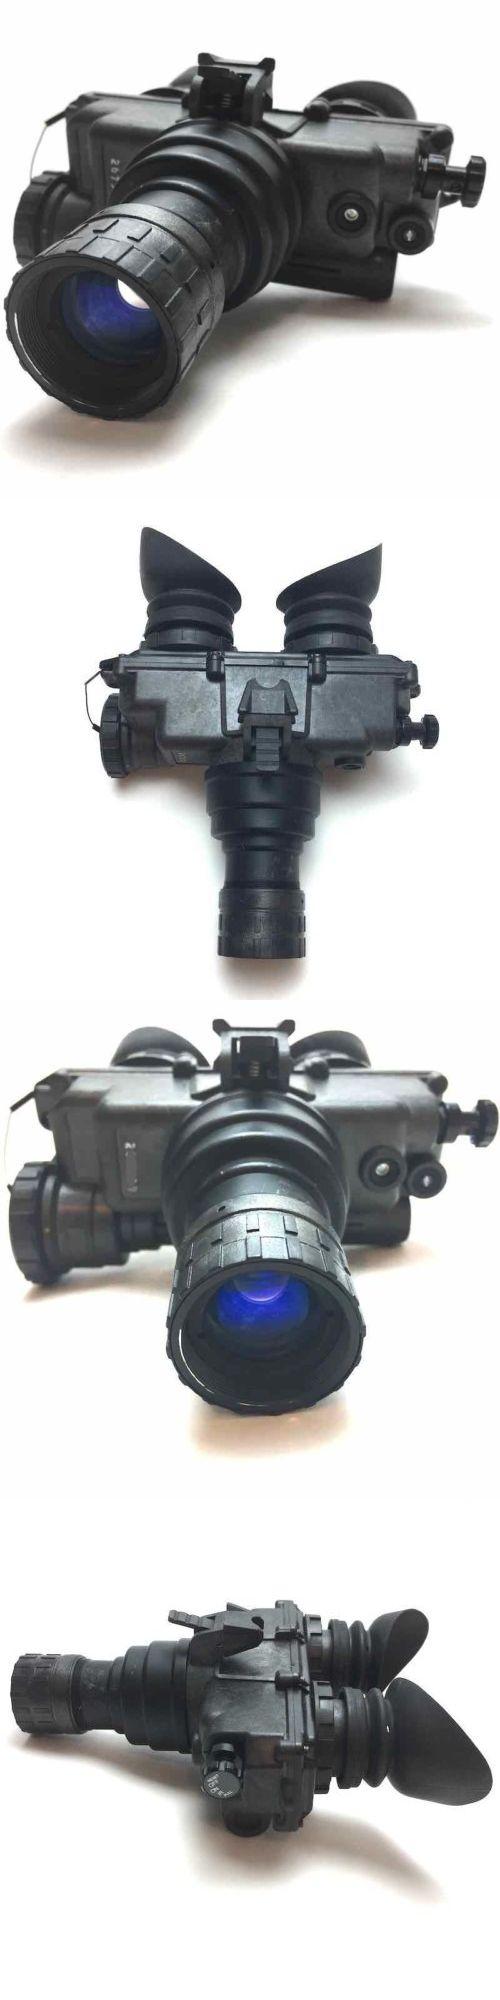 Night Vision Optics 40970: An Pvs-7D Pvs-7 Night Vision Goggles Nvg Gen3 New Nsn: 5855-01-422-5413 -> BUY IT NOW ONLY: $1980 on eBay!